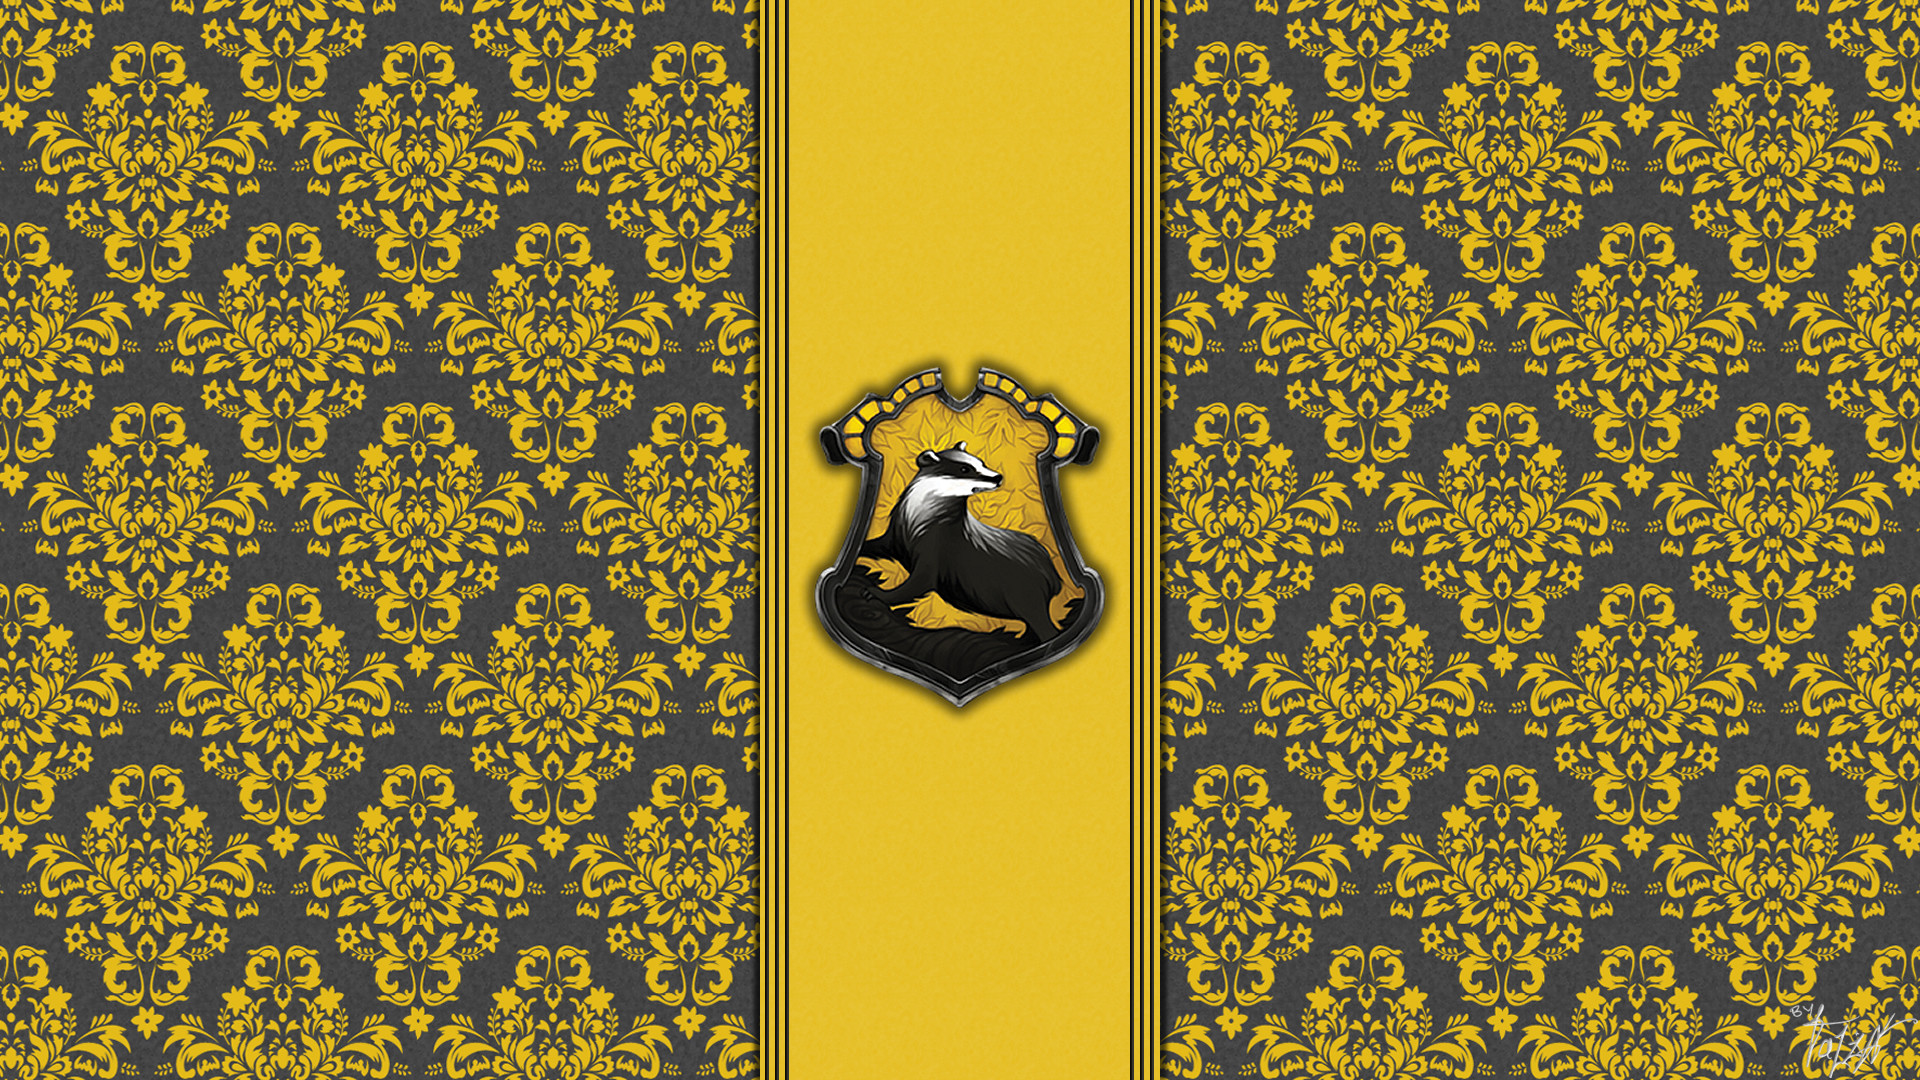 House hufflepuff wallpaper hogwarts paper art theladyavatar | Harry Potter  | Pinterest | Colors, Paper and Desktop wallpapers